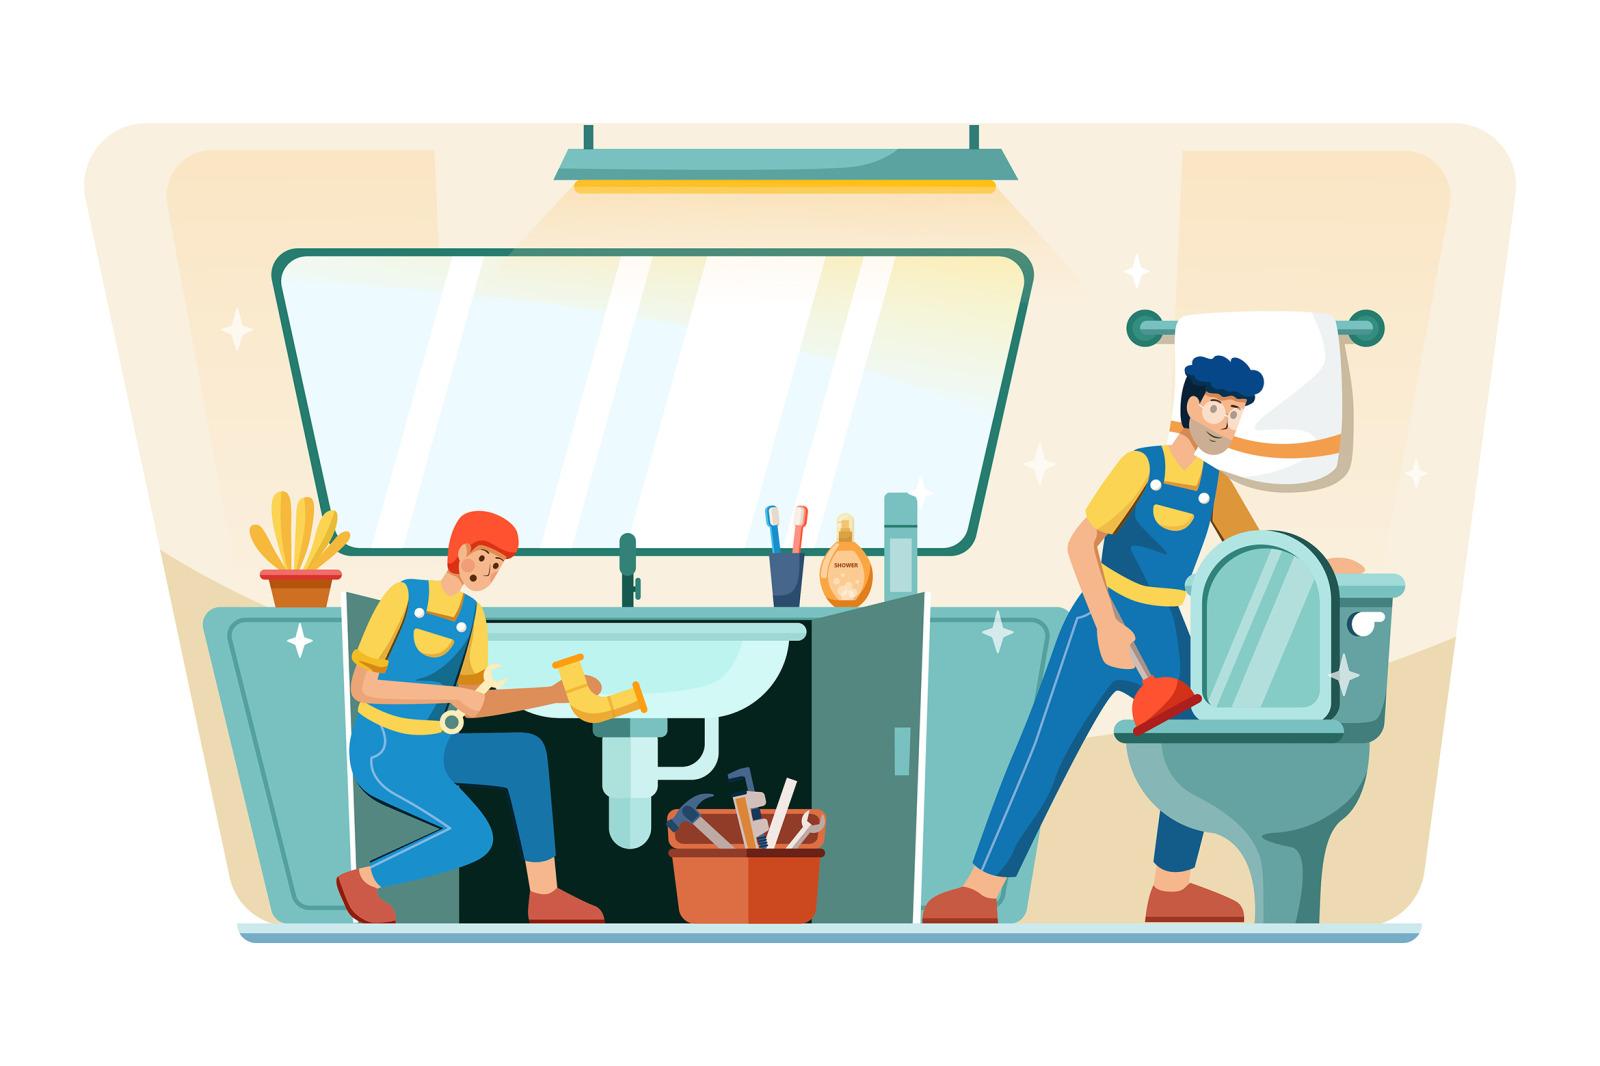 M136_Plumbing Service Illustrations